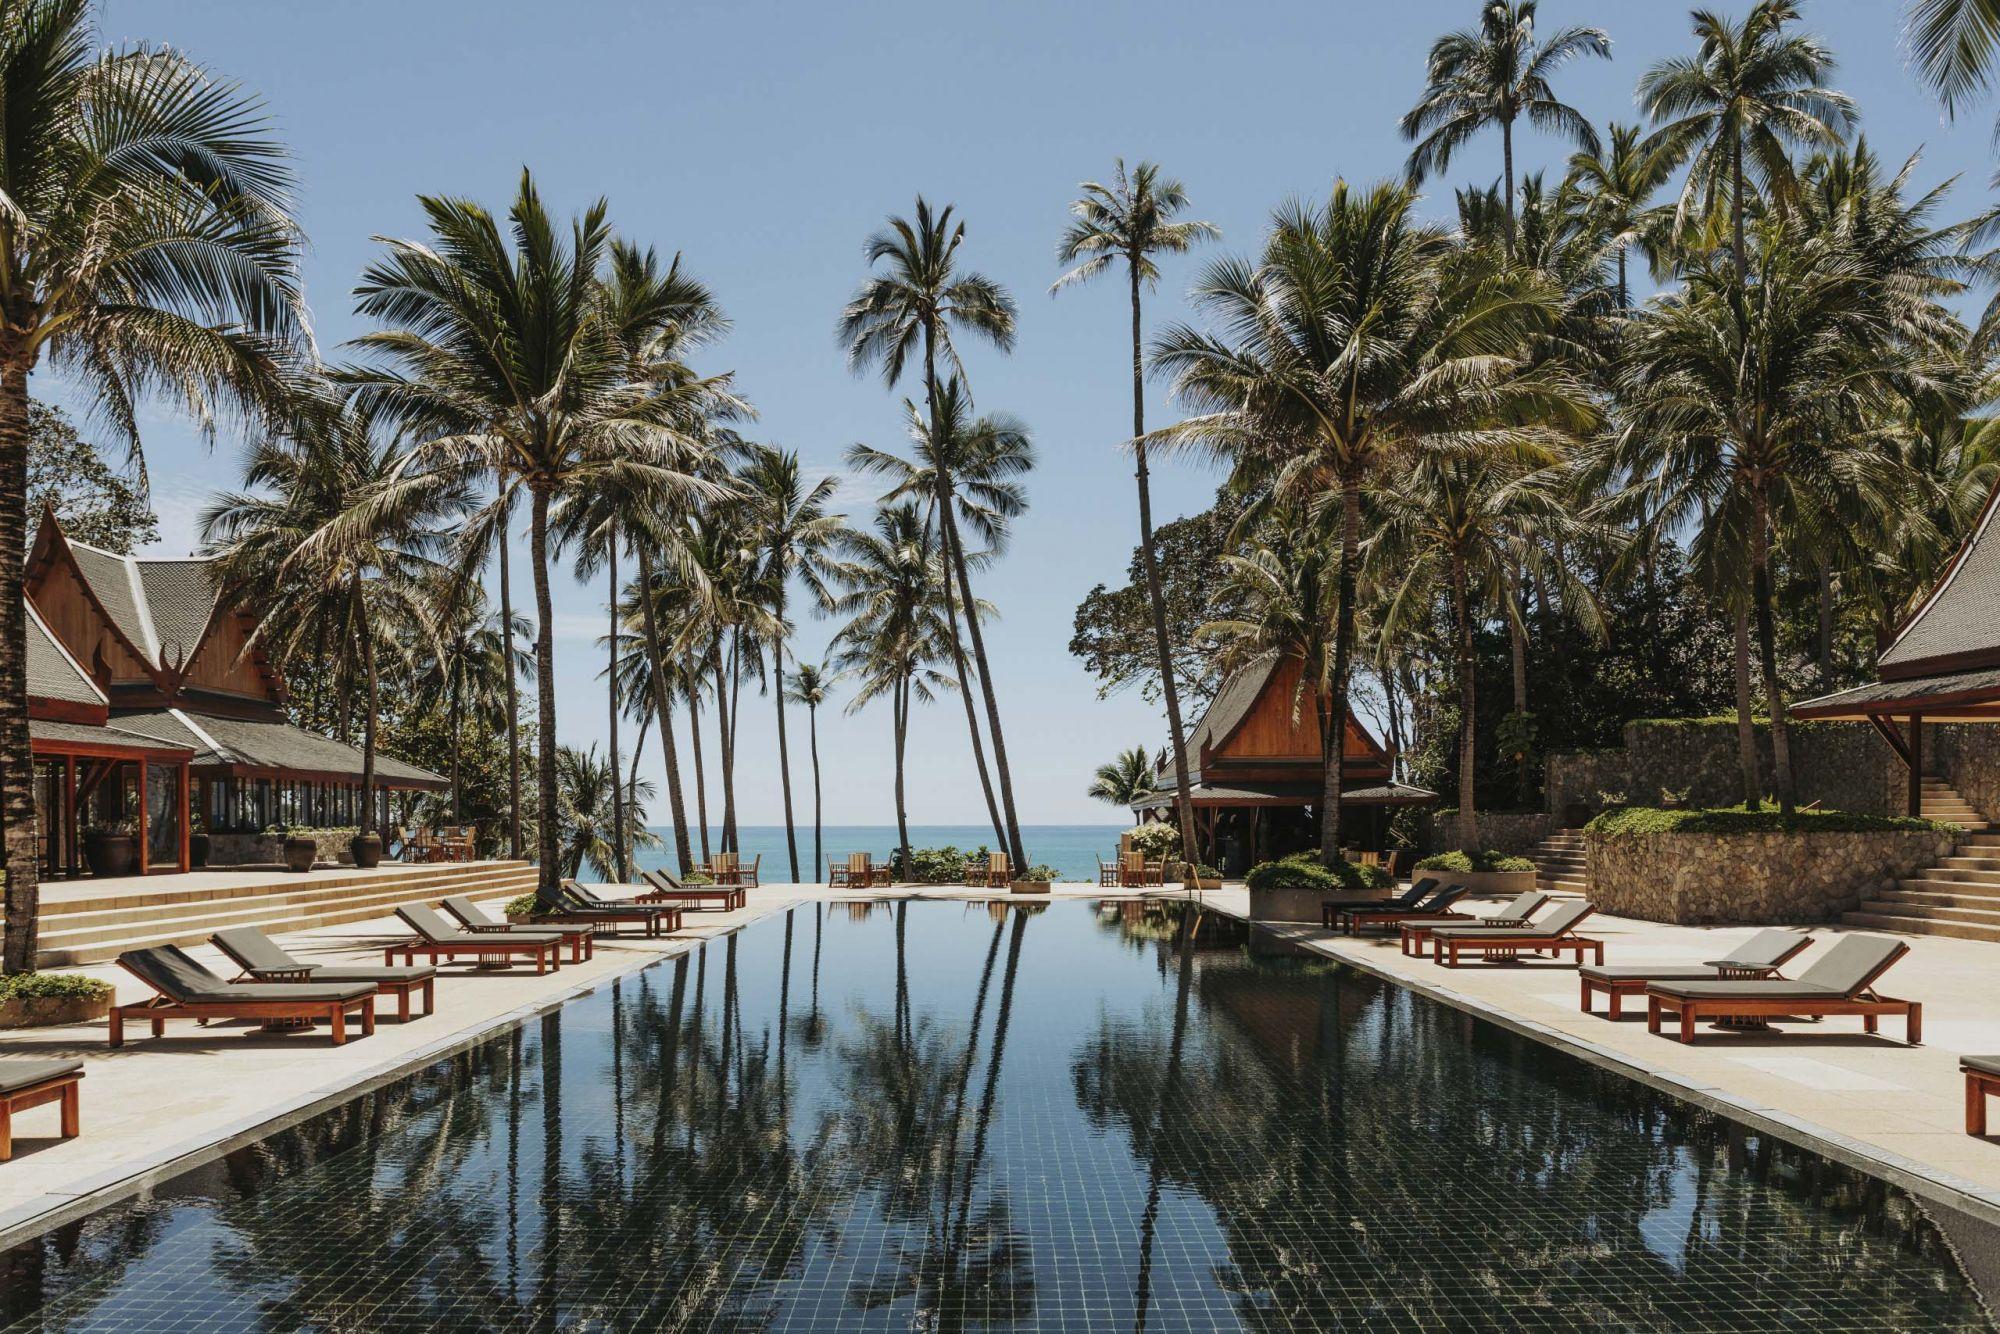 Amanpuri, Thailand - Resort, Main Pool